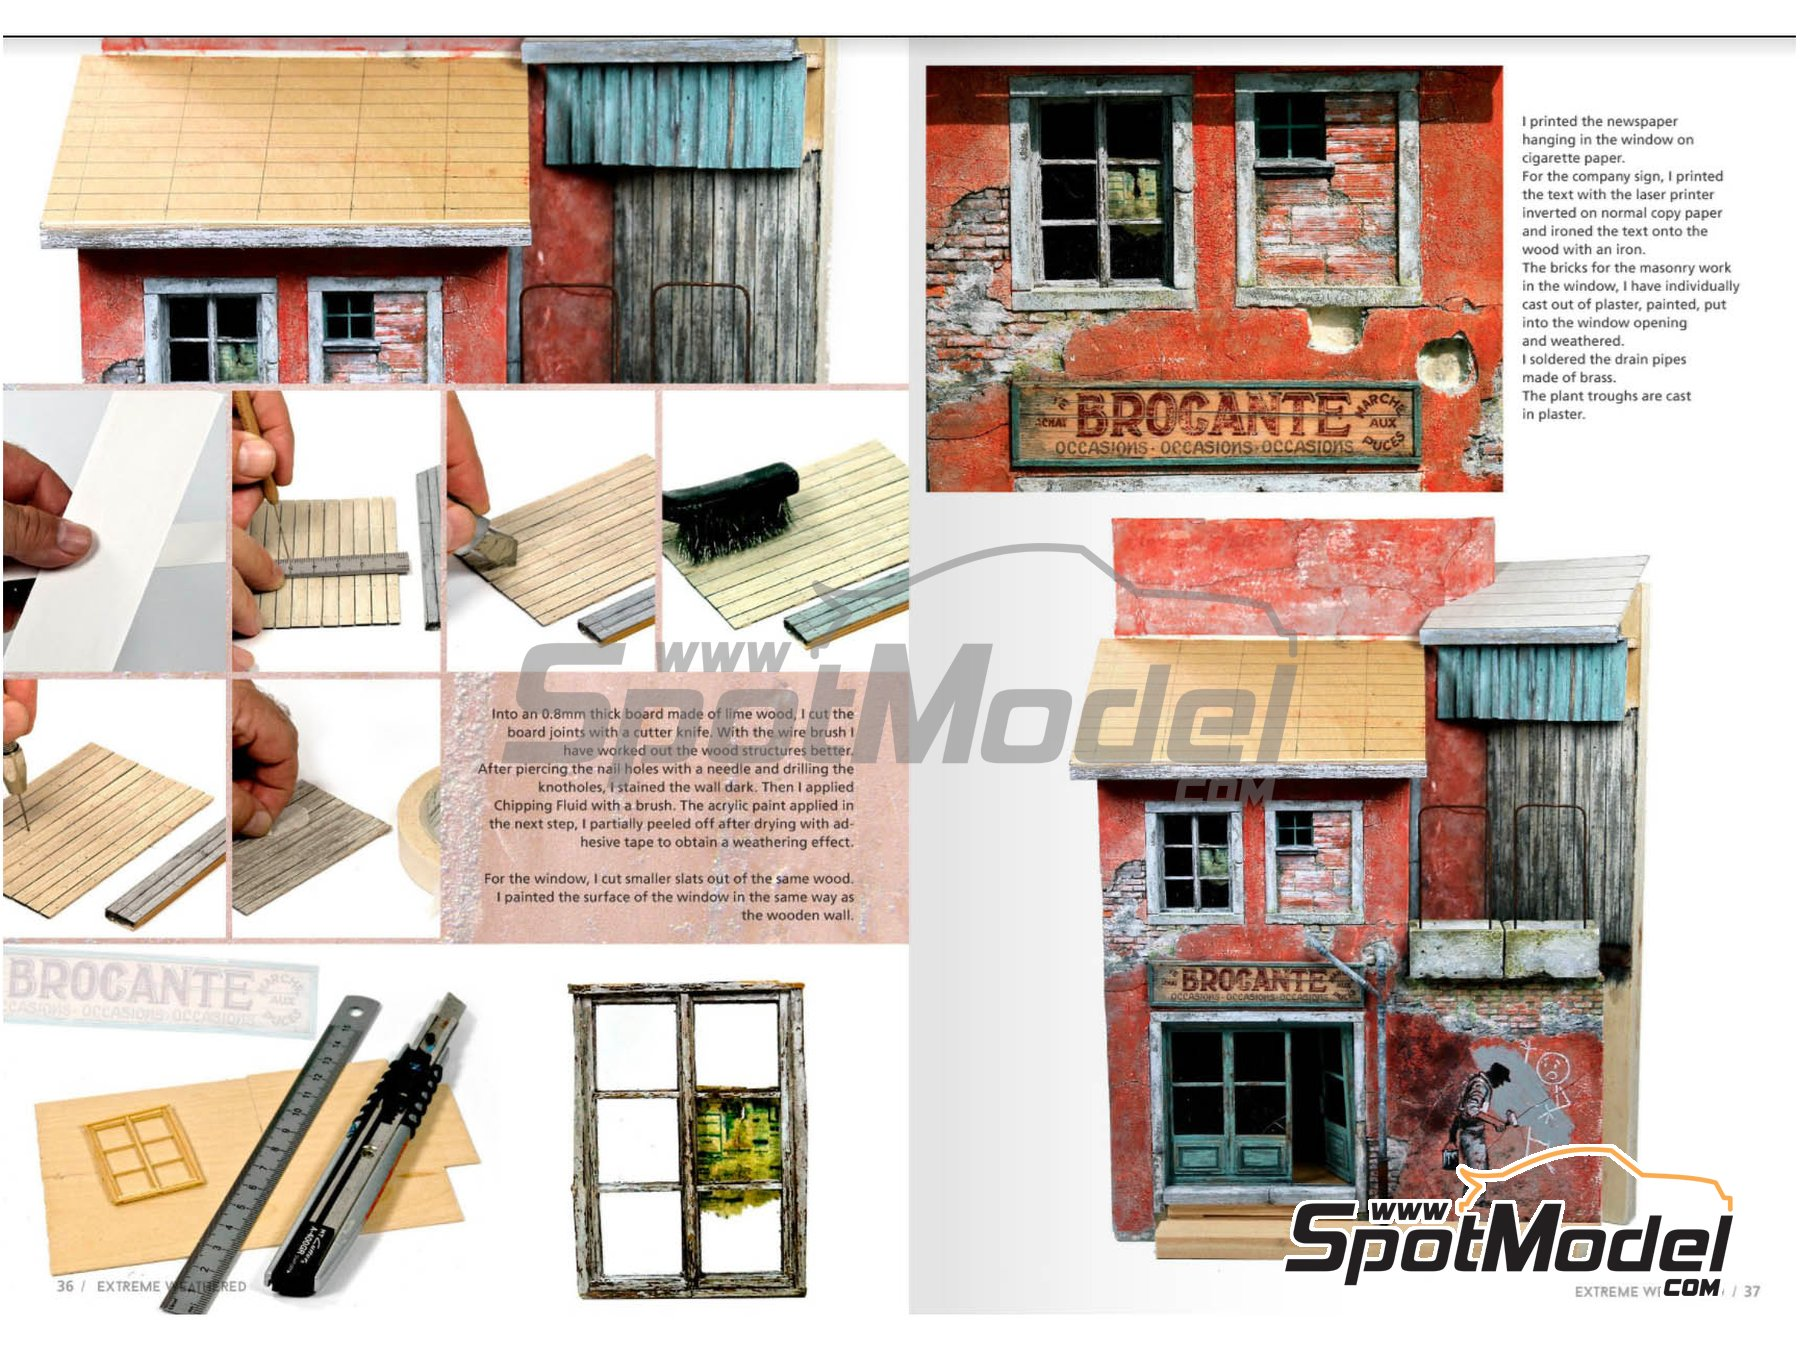 Image 5: Extreme Reality 3 - Vehiculos y entornos degradados | Book manufactured by AK Interactive (ref.AK-509)